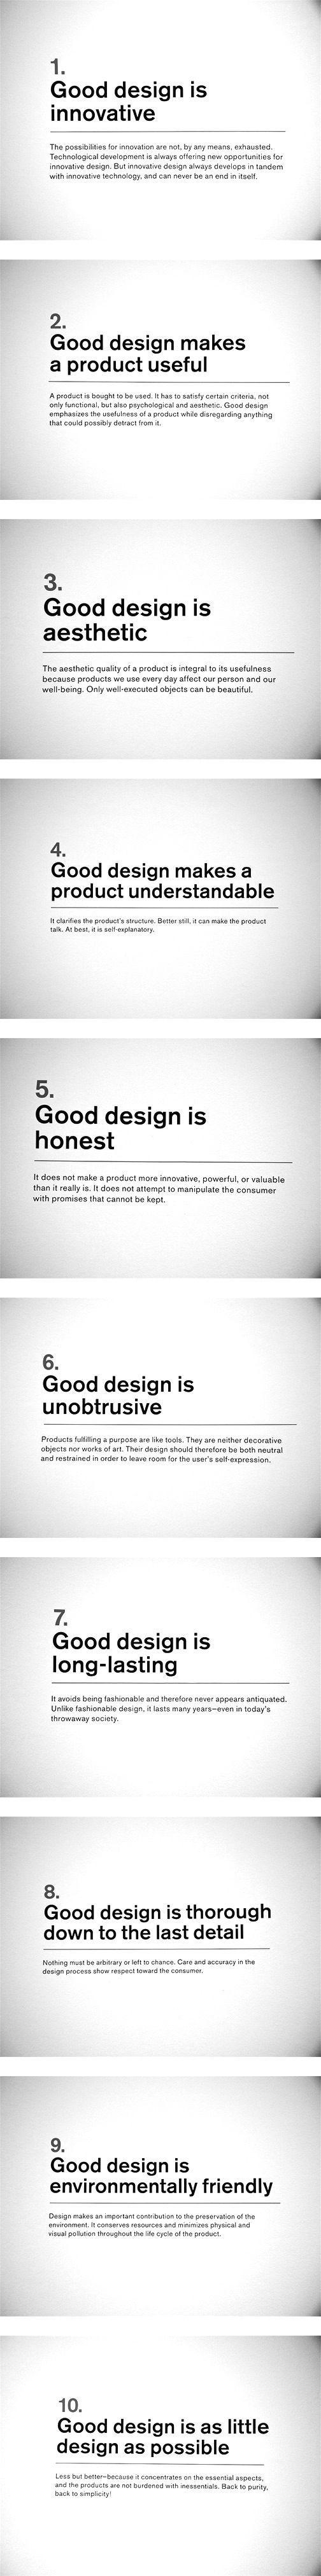 Dieter Ramms 10 principles of good design